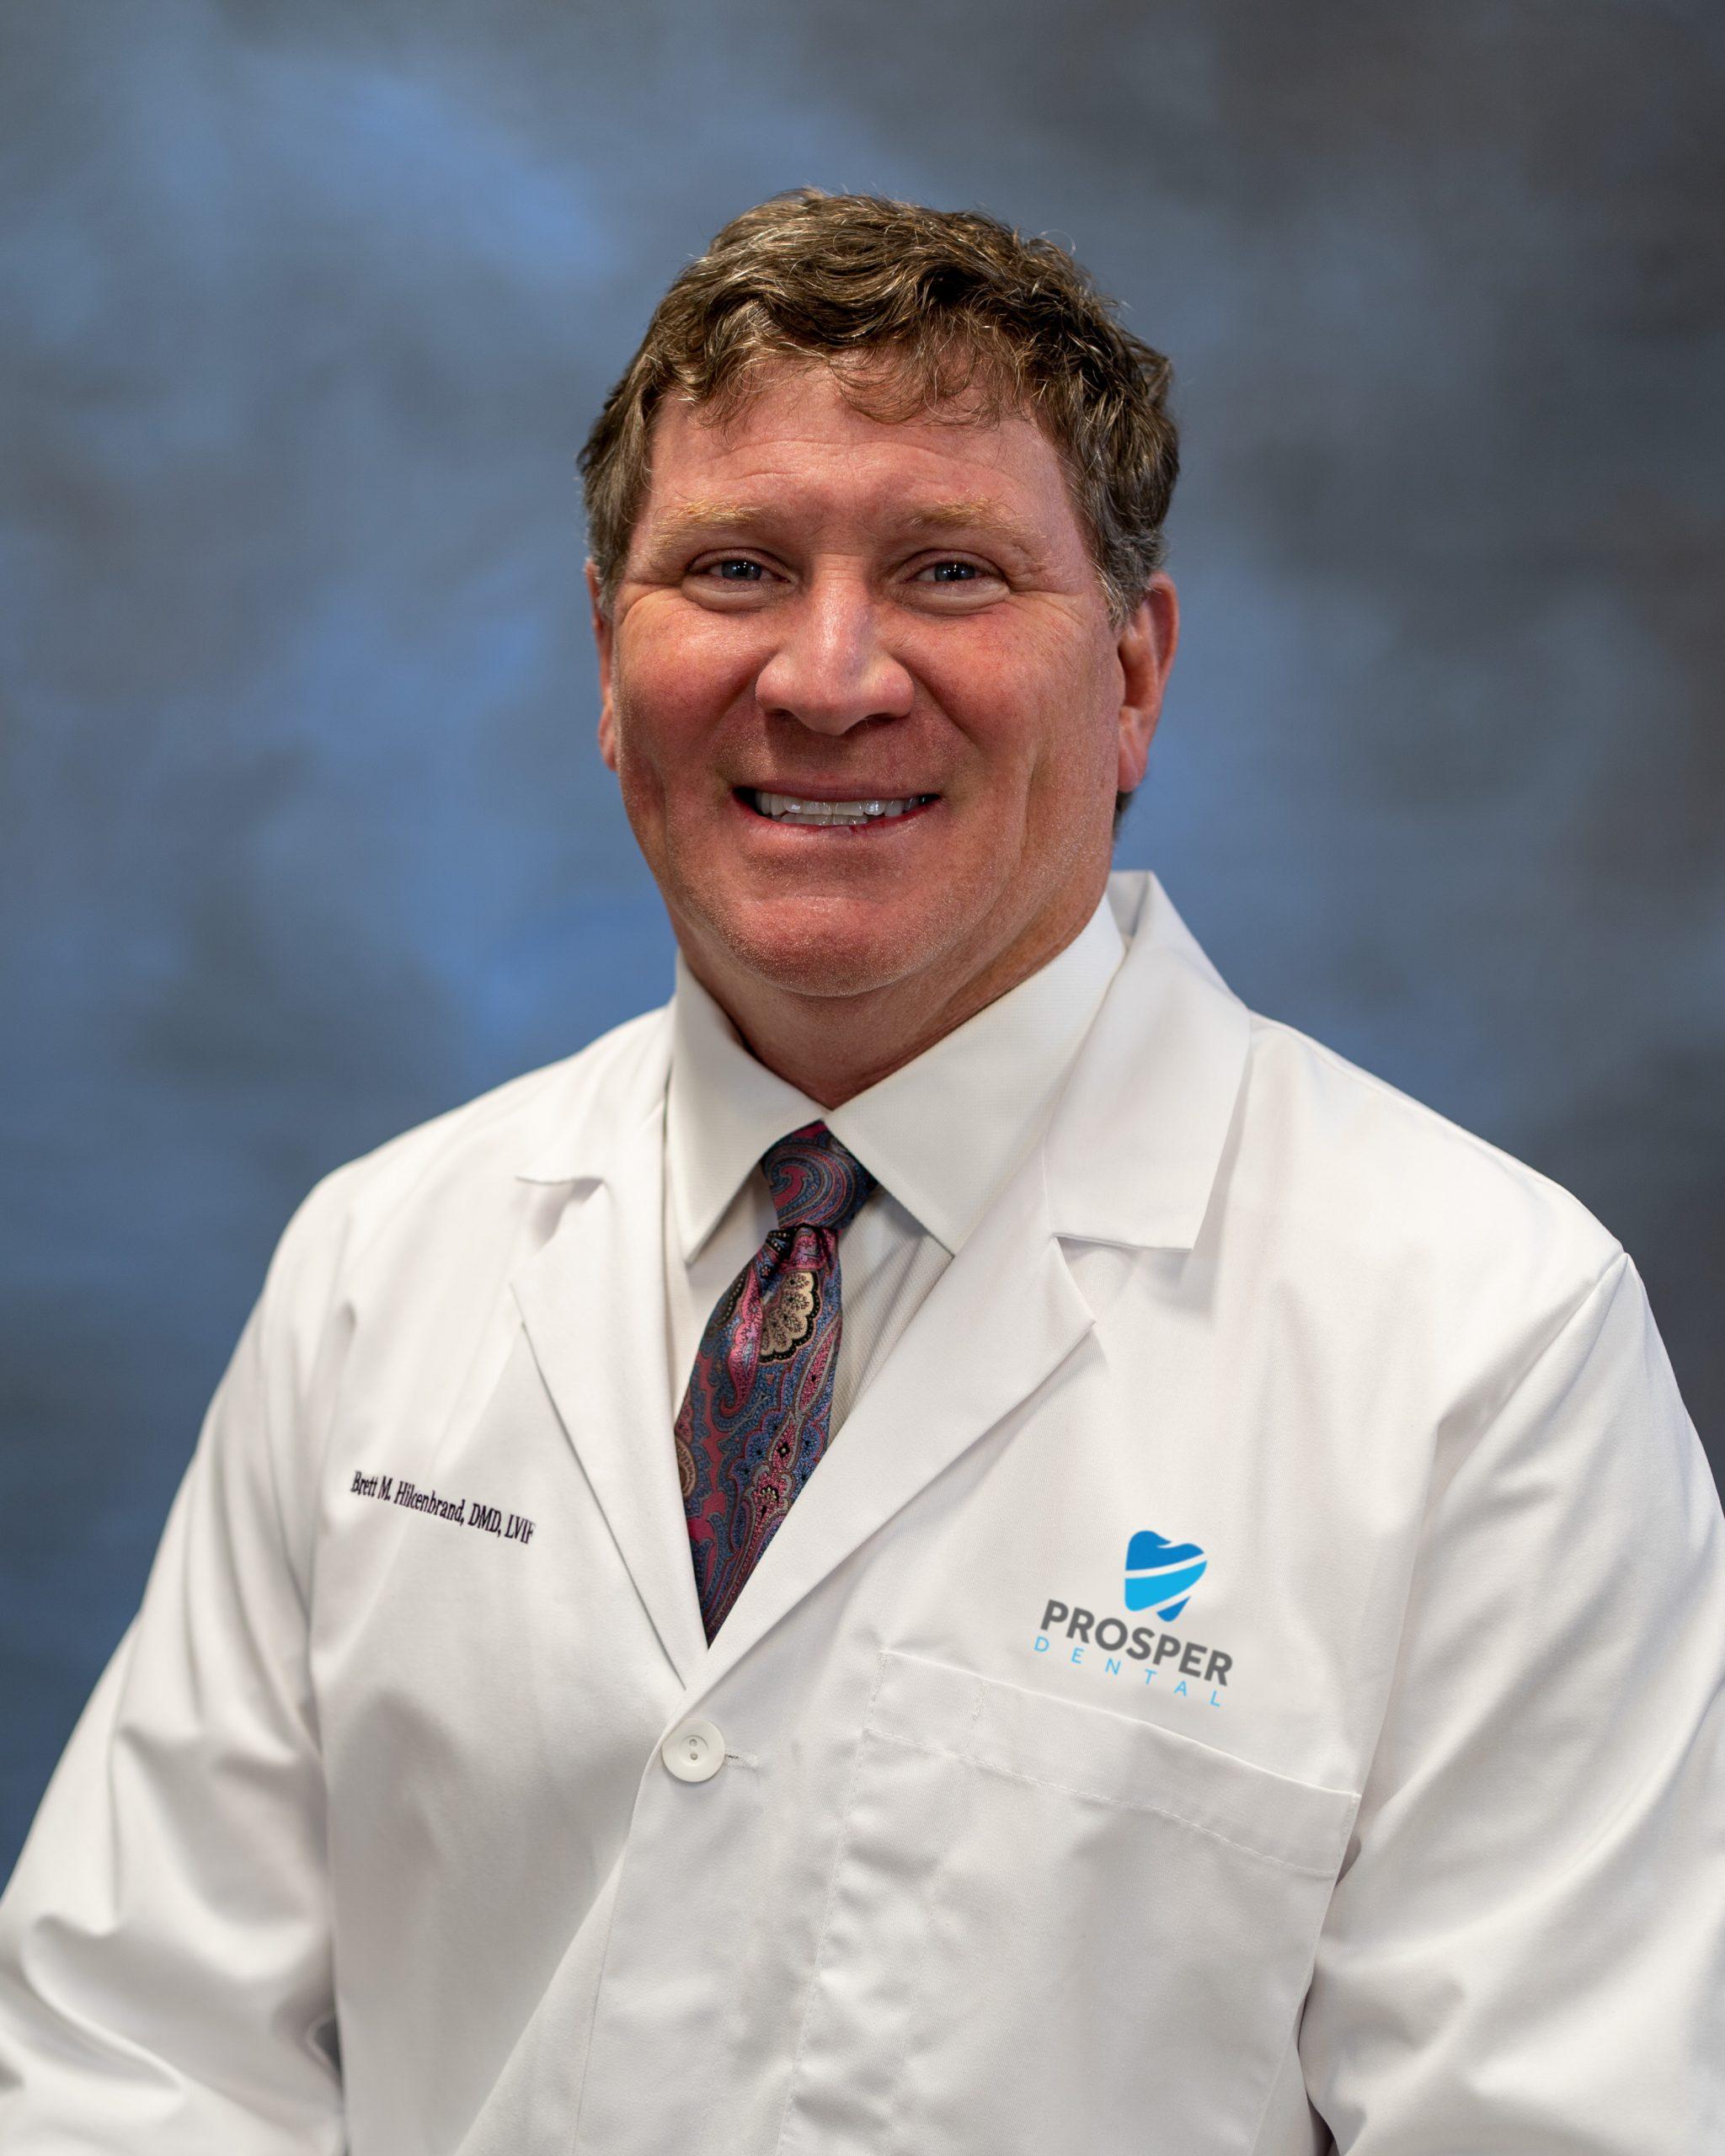 Dr. Hildenbrand